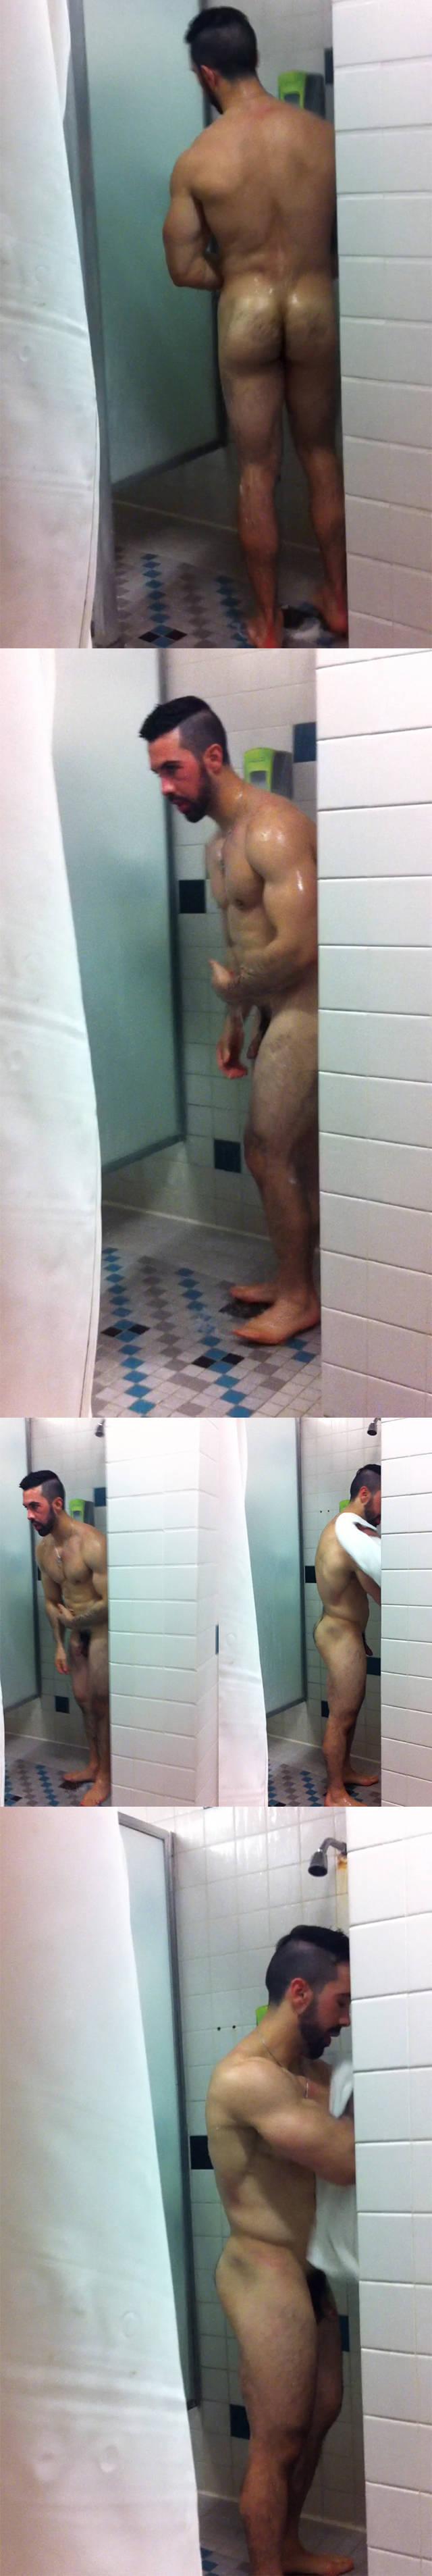 spycam stud naked shower full frontal